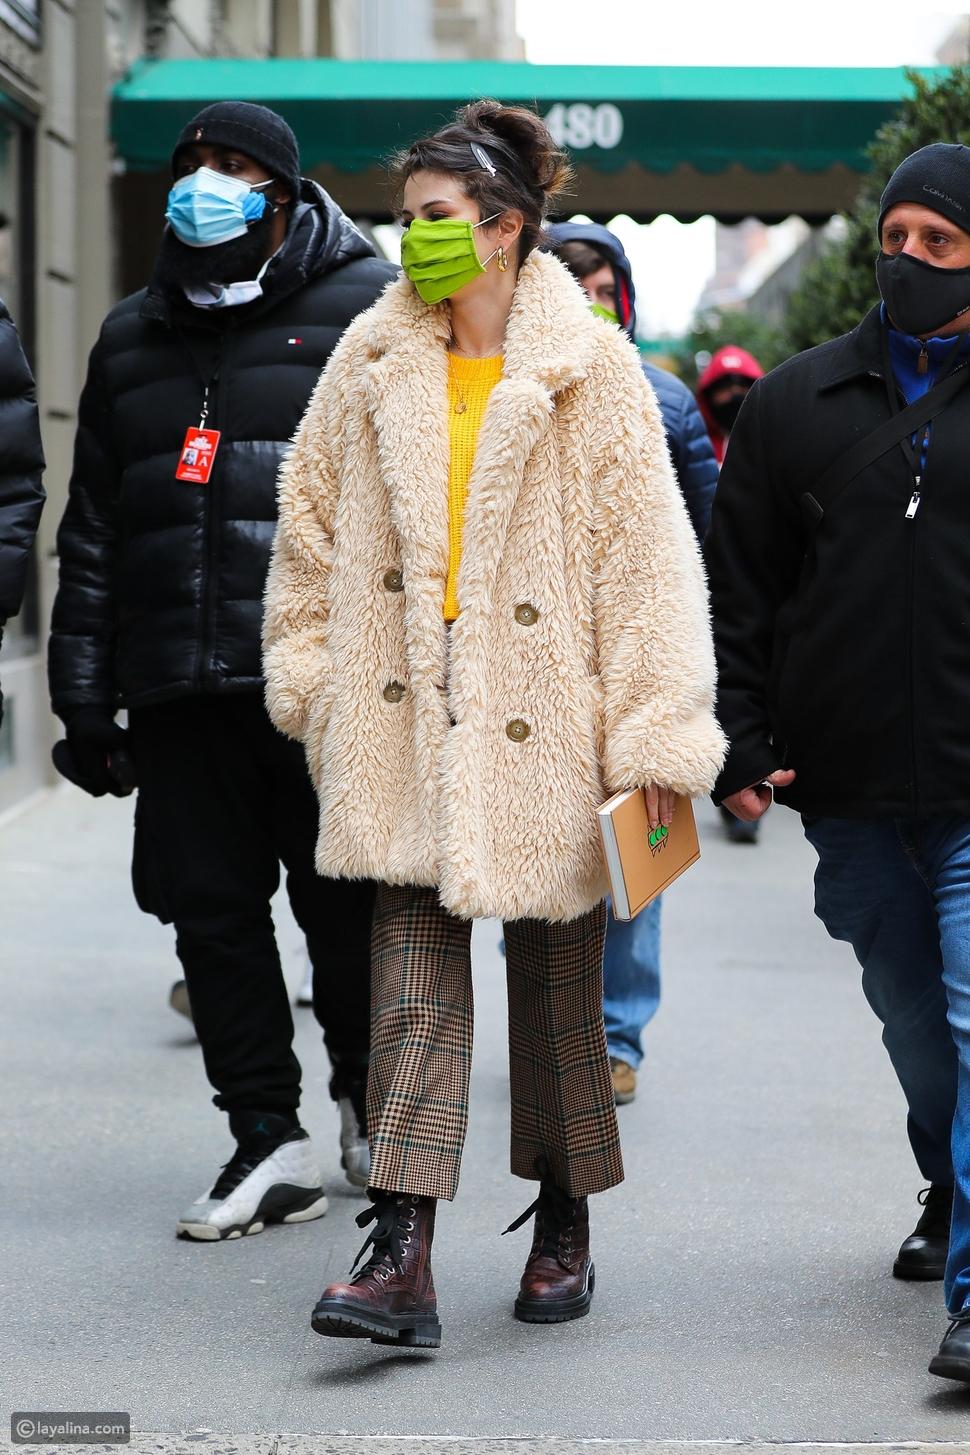 ارتدي معطف تيدي مثل سيلينا غوميز